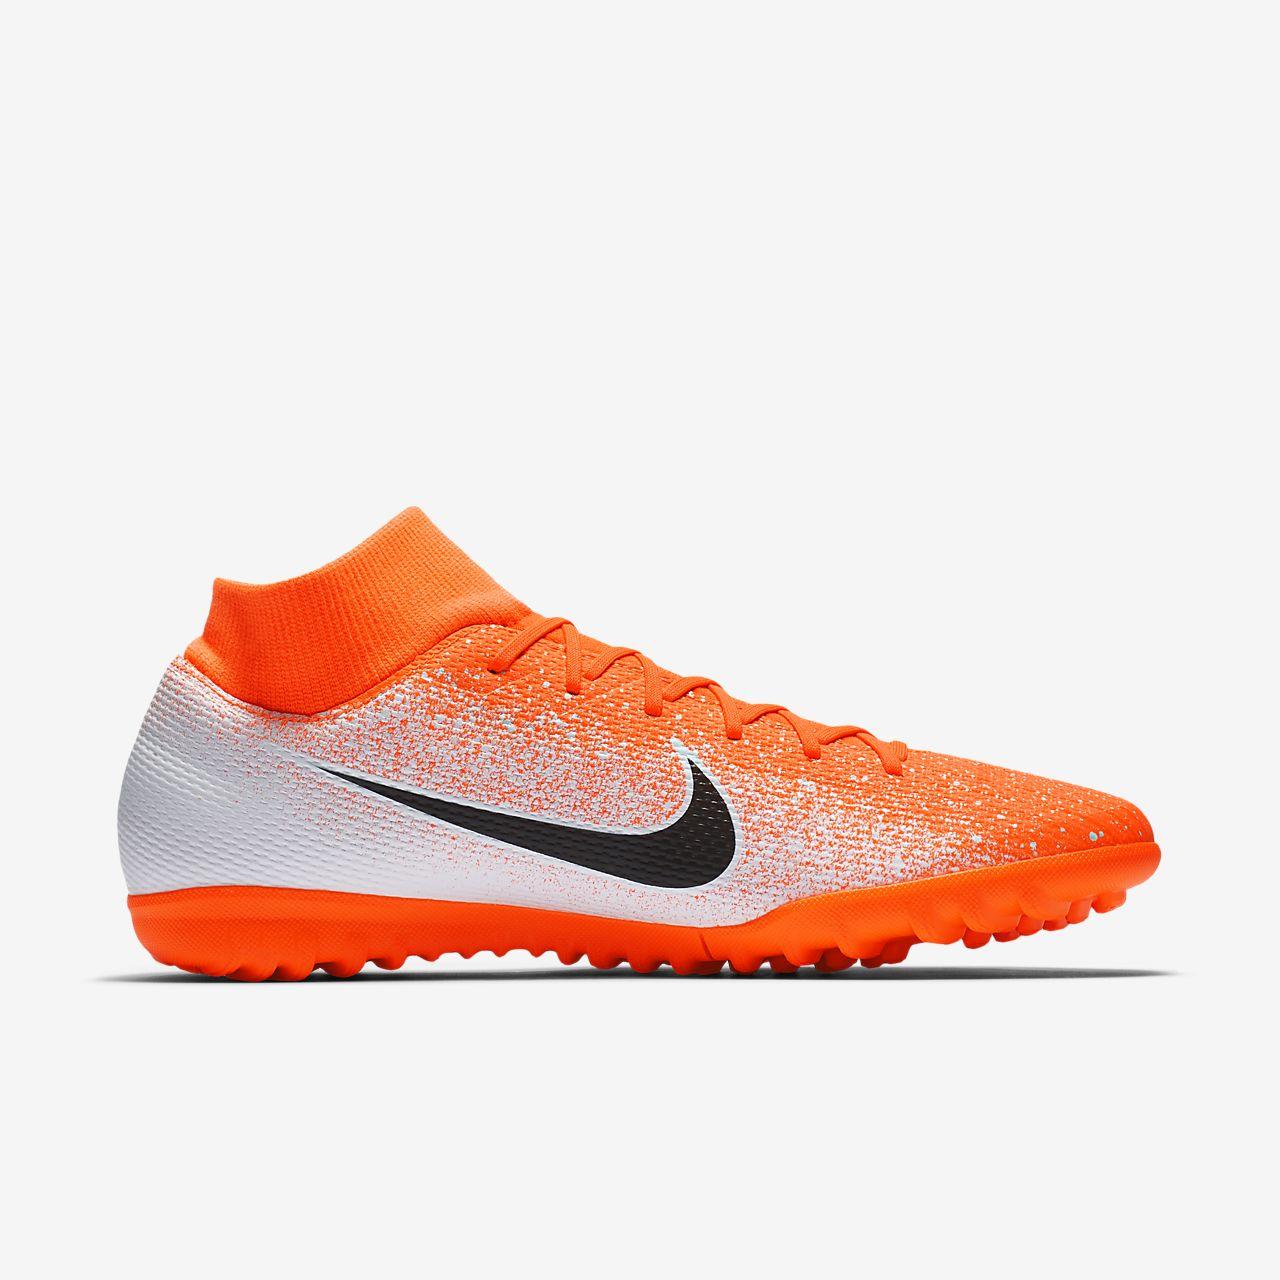 7bfeeca5c Nike SuperflyX 6 Academy TF Turf Football Boot. Nike.com CA